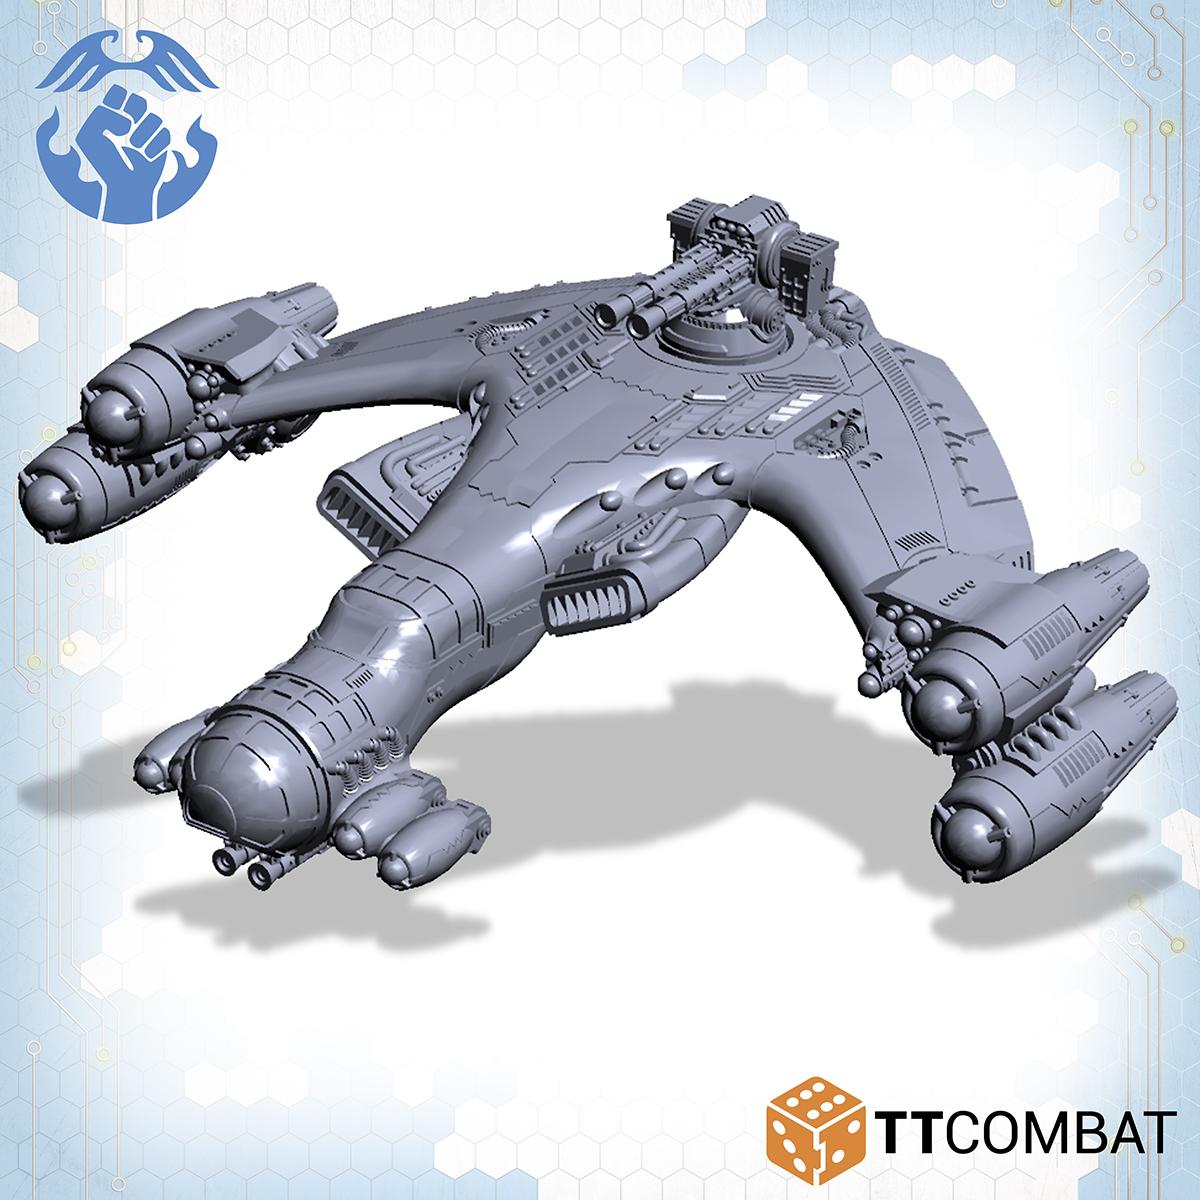 [Image: TTC-Lifthawk.jpg]